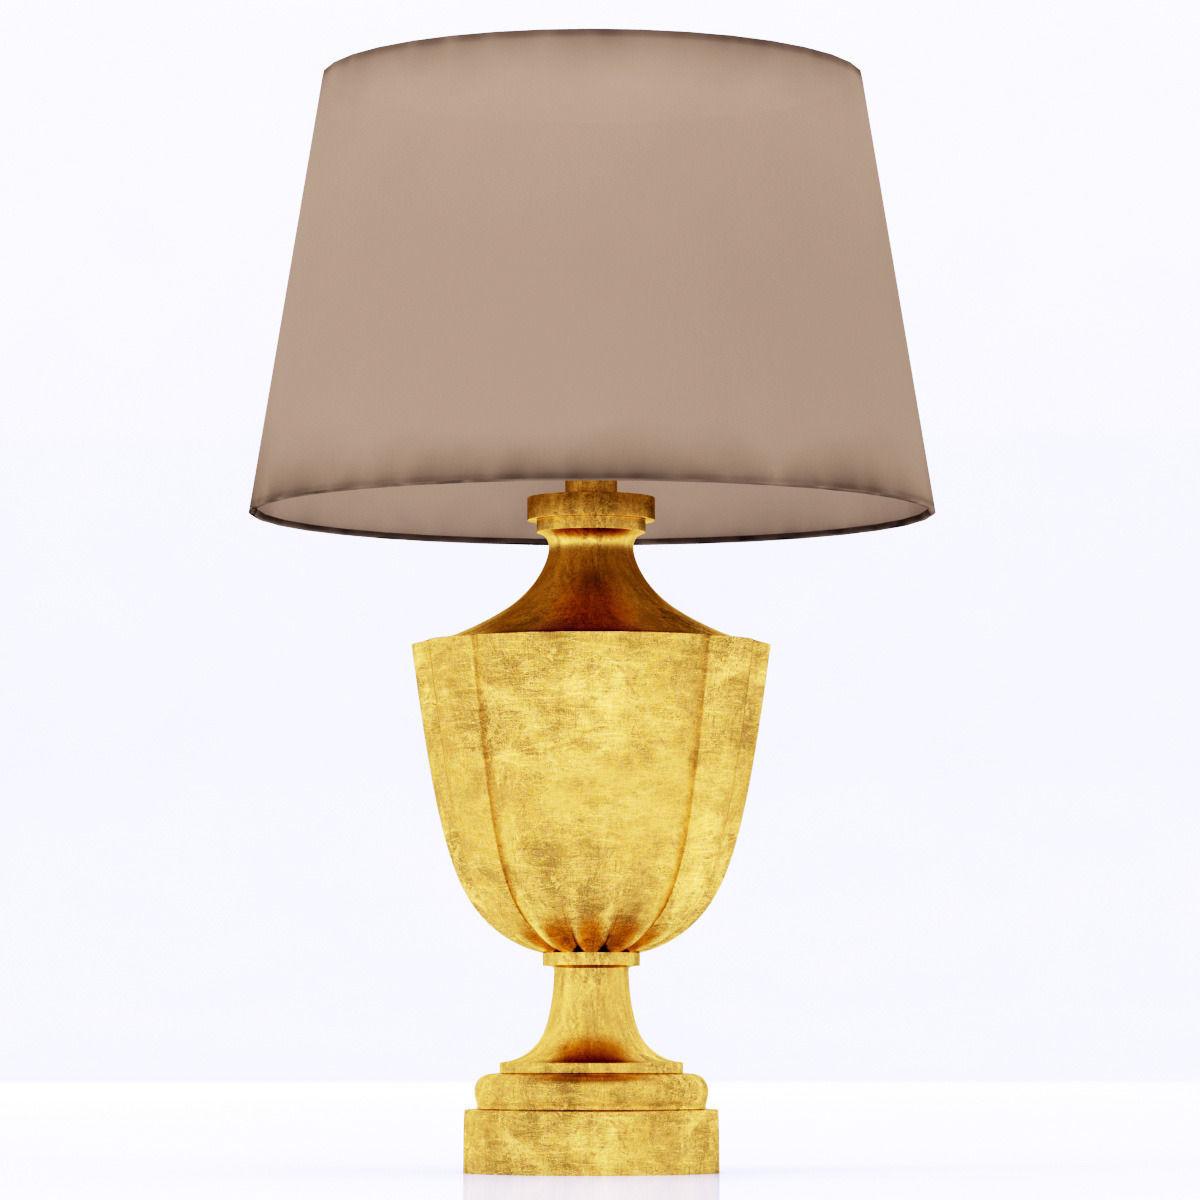 Circa Lighting Marlborough Table Lamp